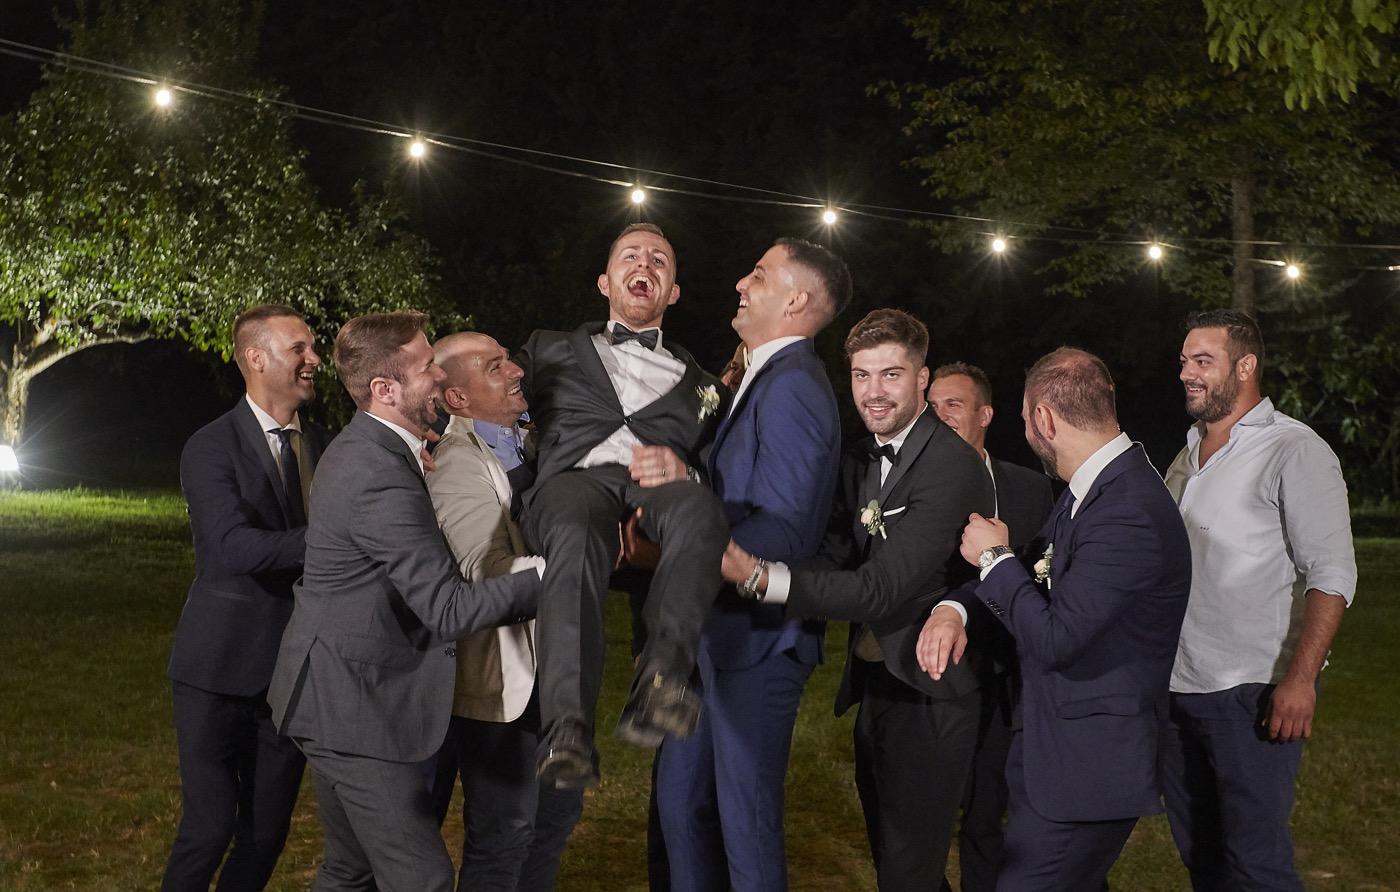 Claudio-Coppola-wedding-photographer-la-scuderia-eventi-preparativi-la-rosetta-perugia-97